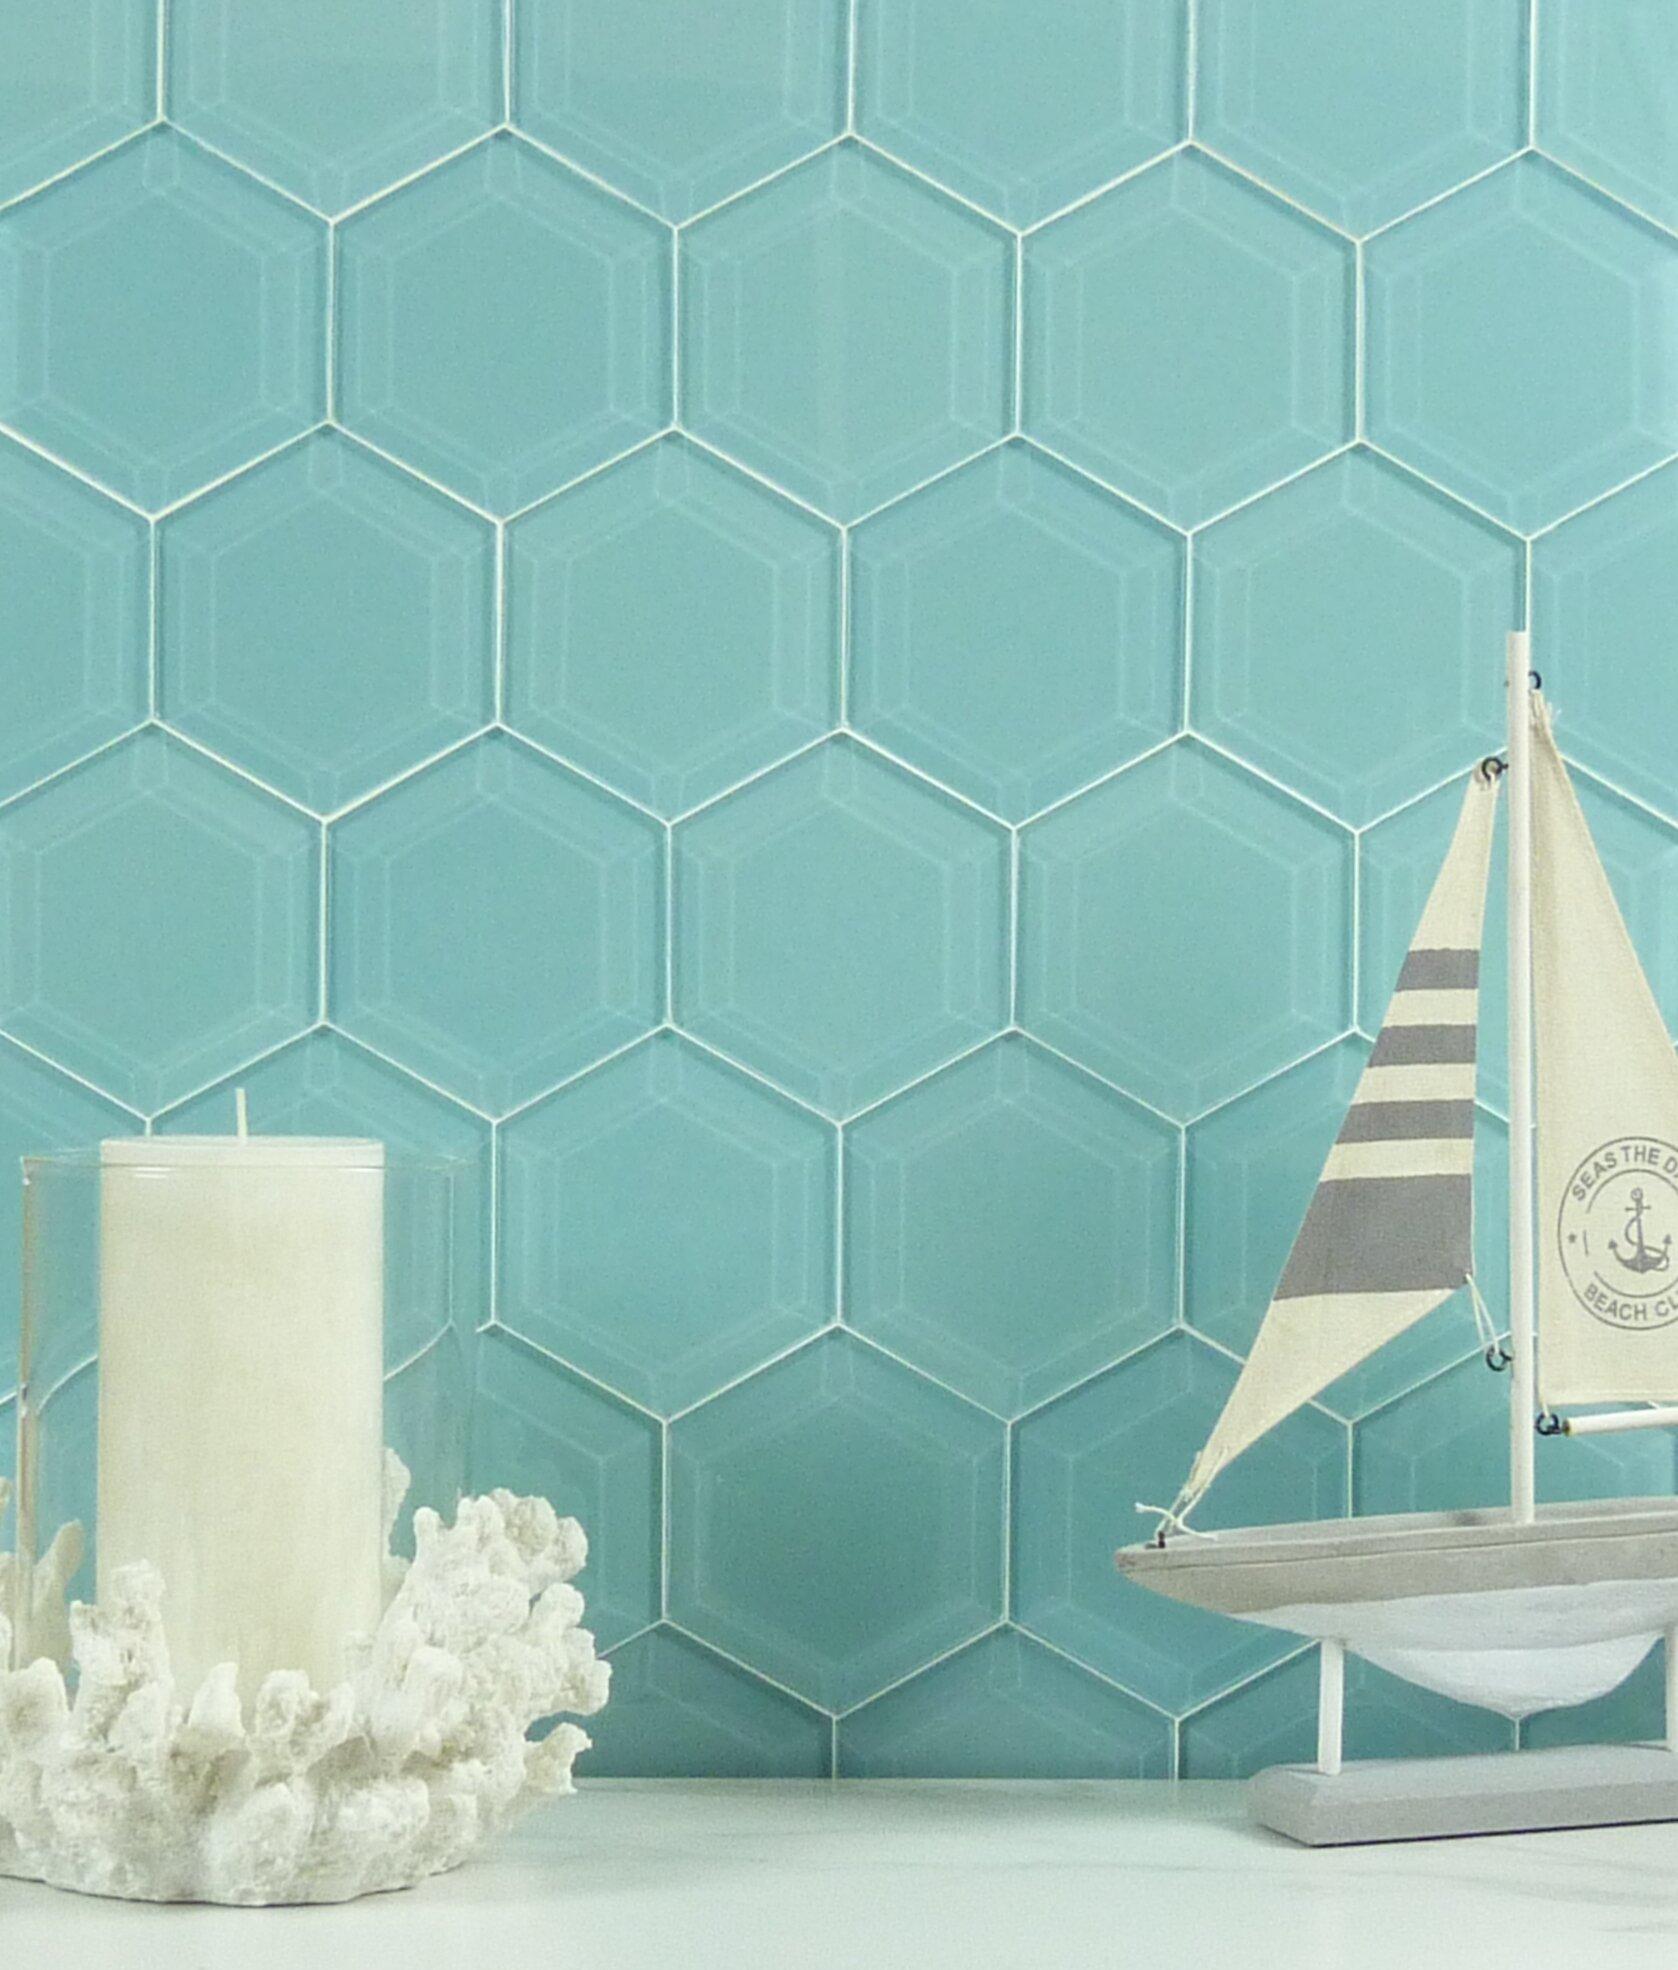 Steeple Beveled Hexagon Glossy